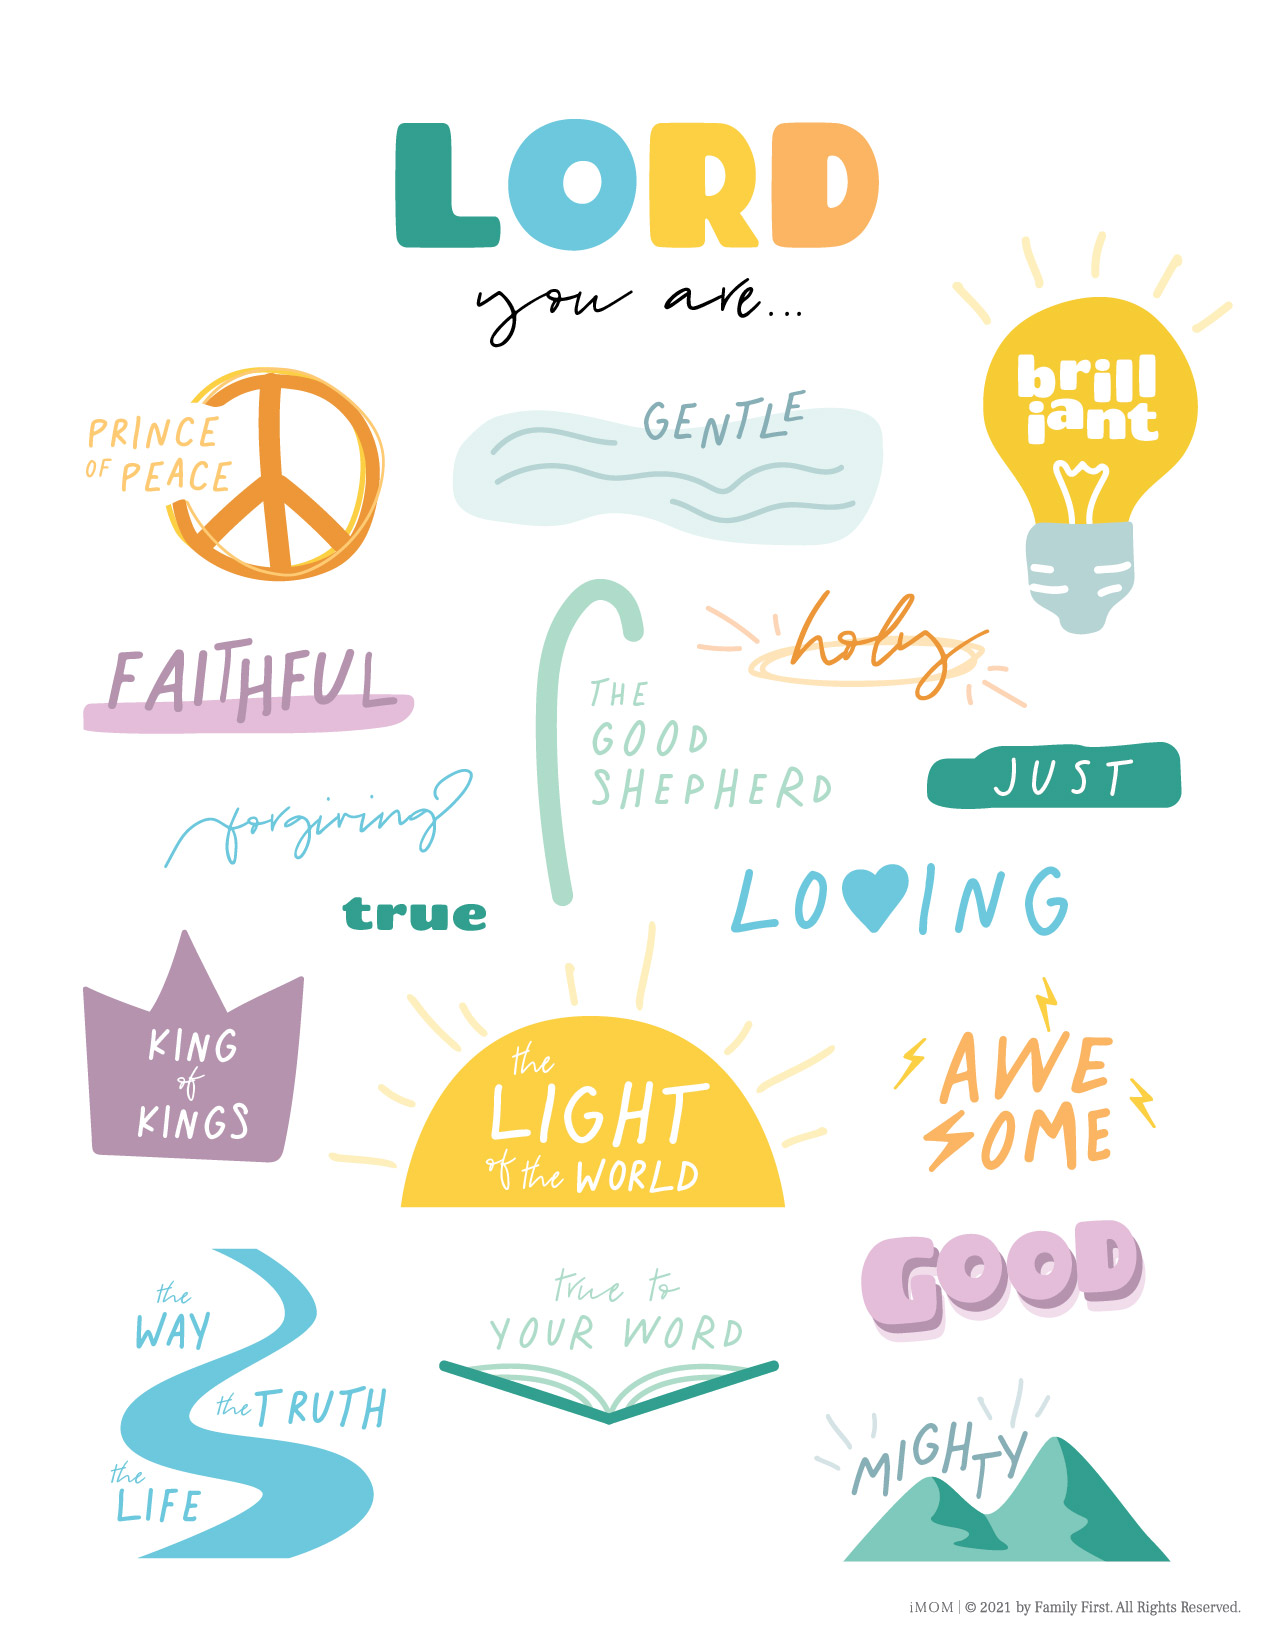 how to praise God